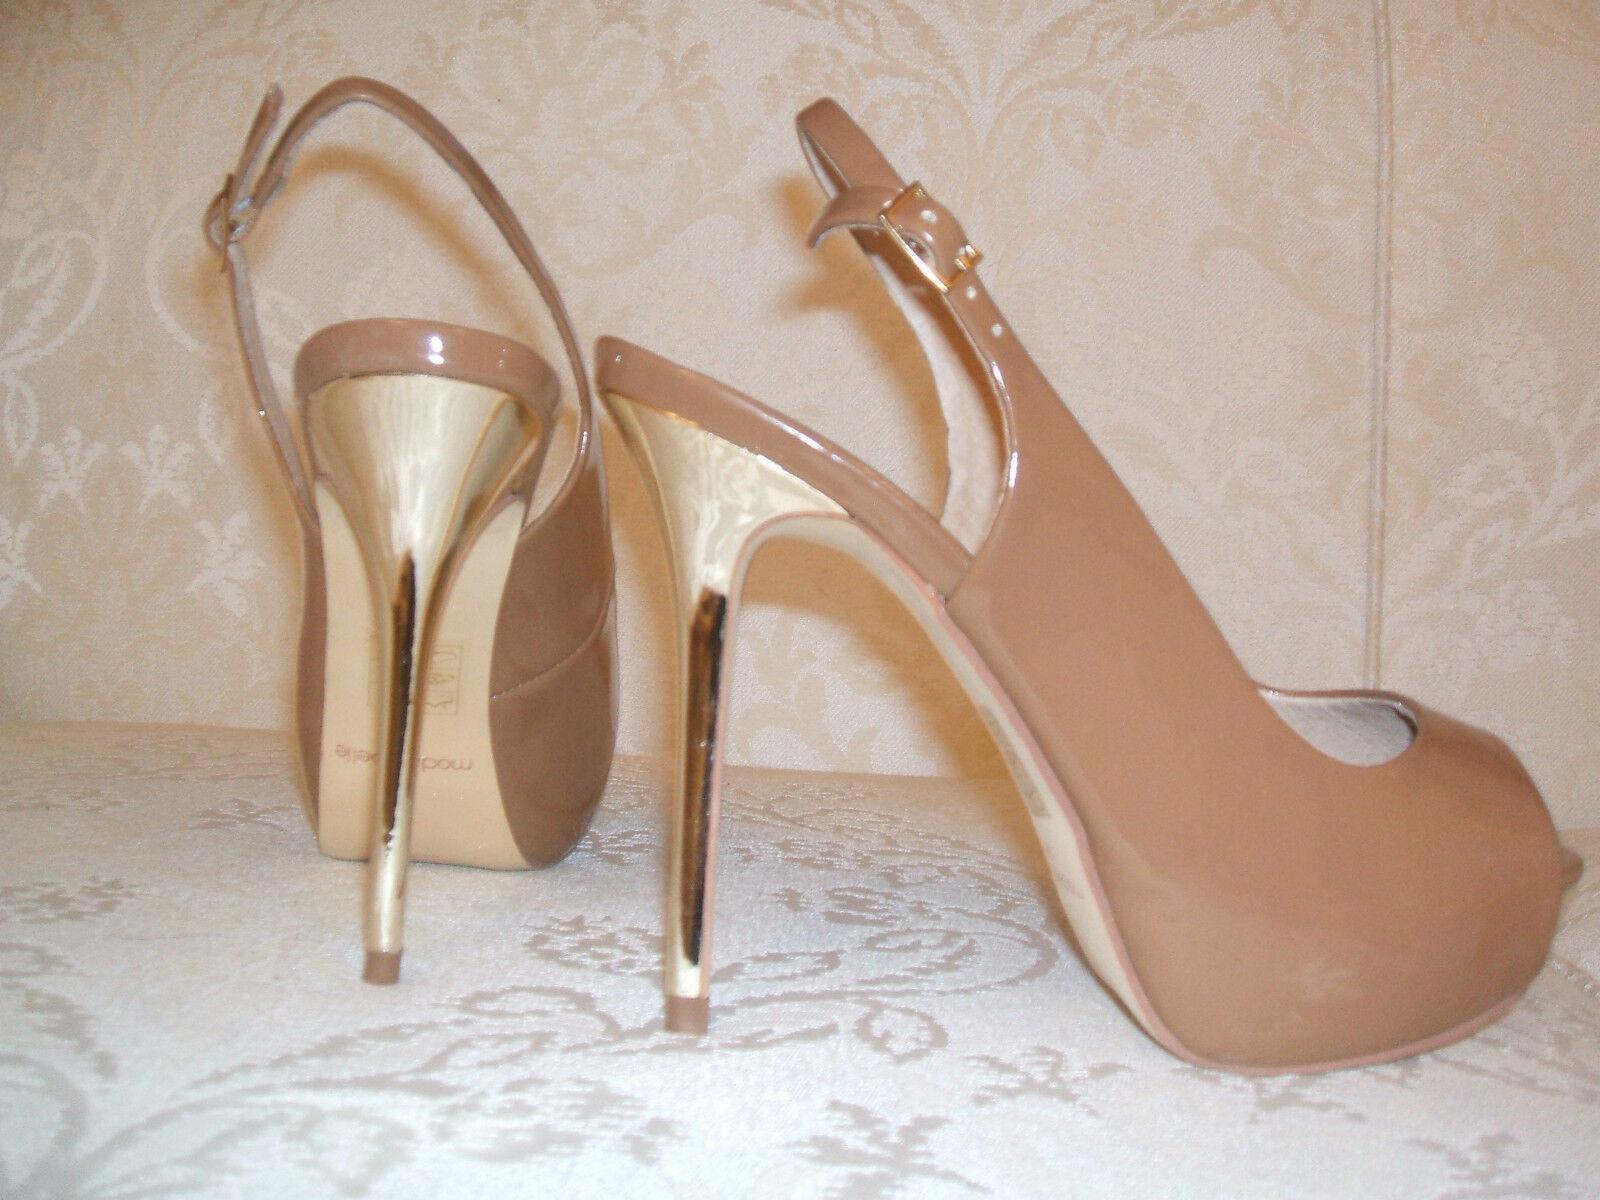 BNIB  SIZE  MODA IN PELLE SIZE  4 5 6 7 8 RAINY BLACK GOLD TAN SLINGBACK Schuhe b11b32